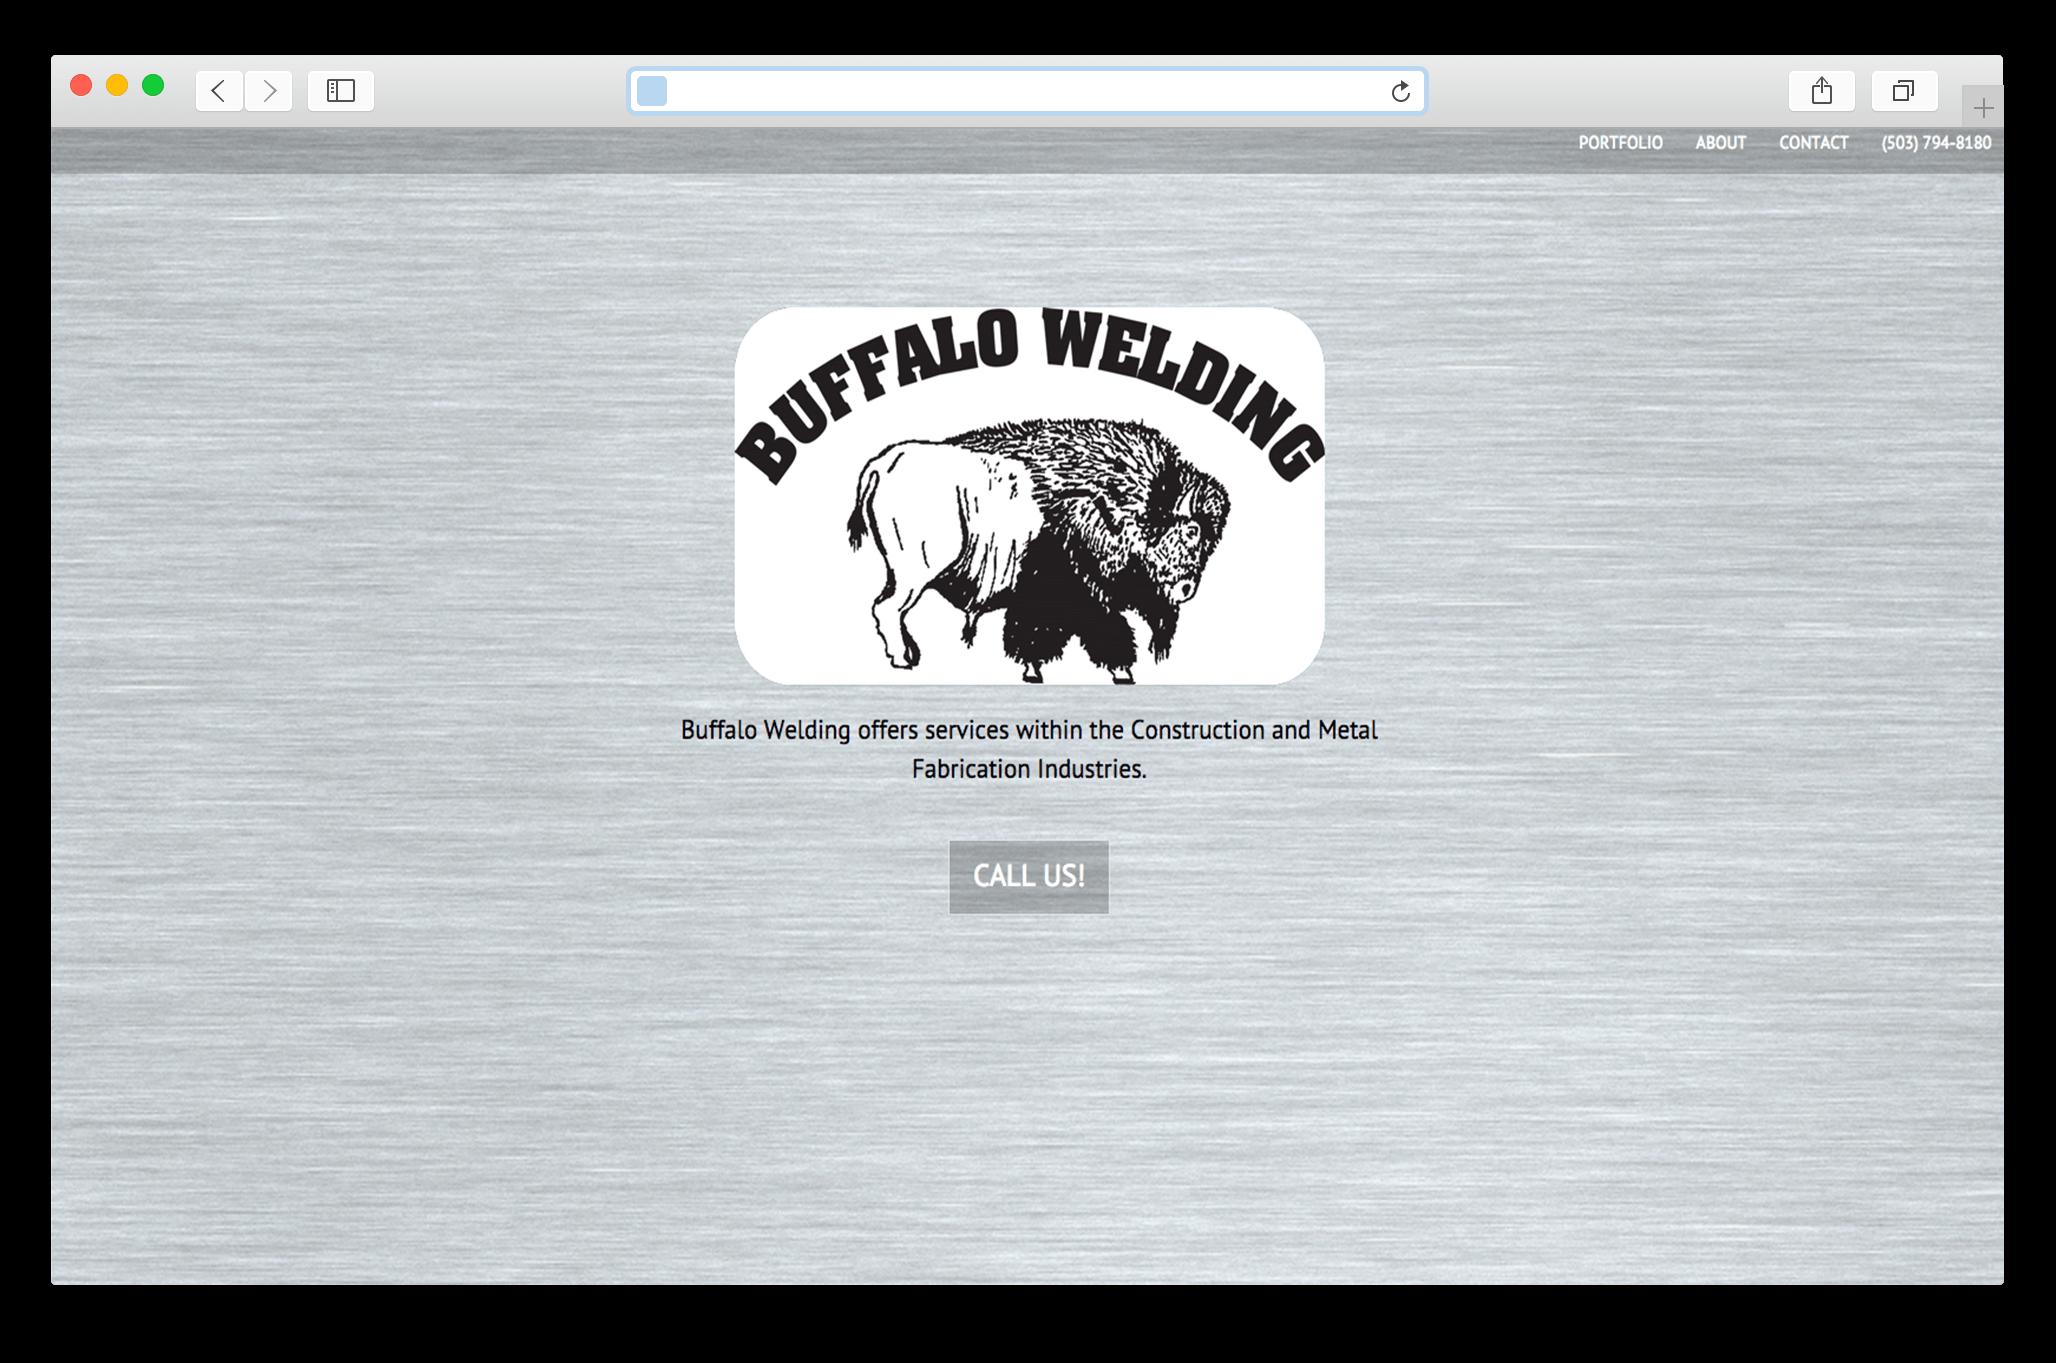 Buffalo Welding